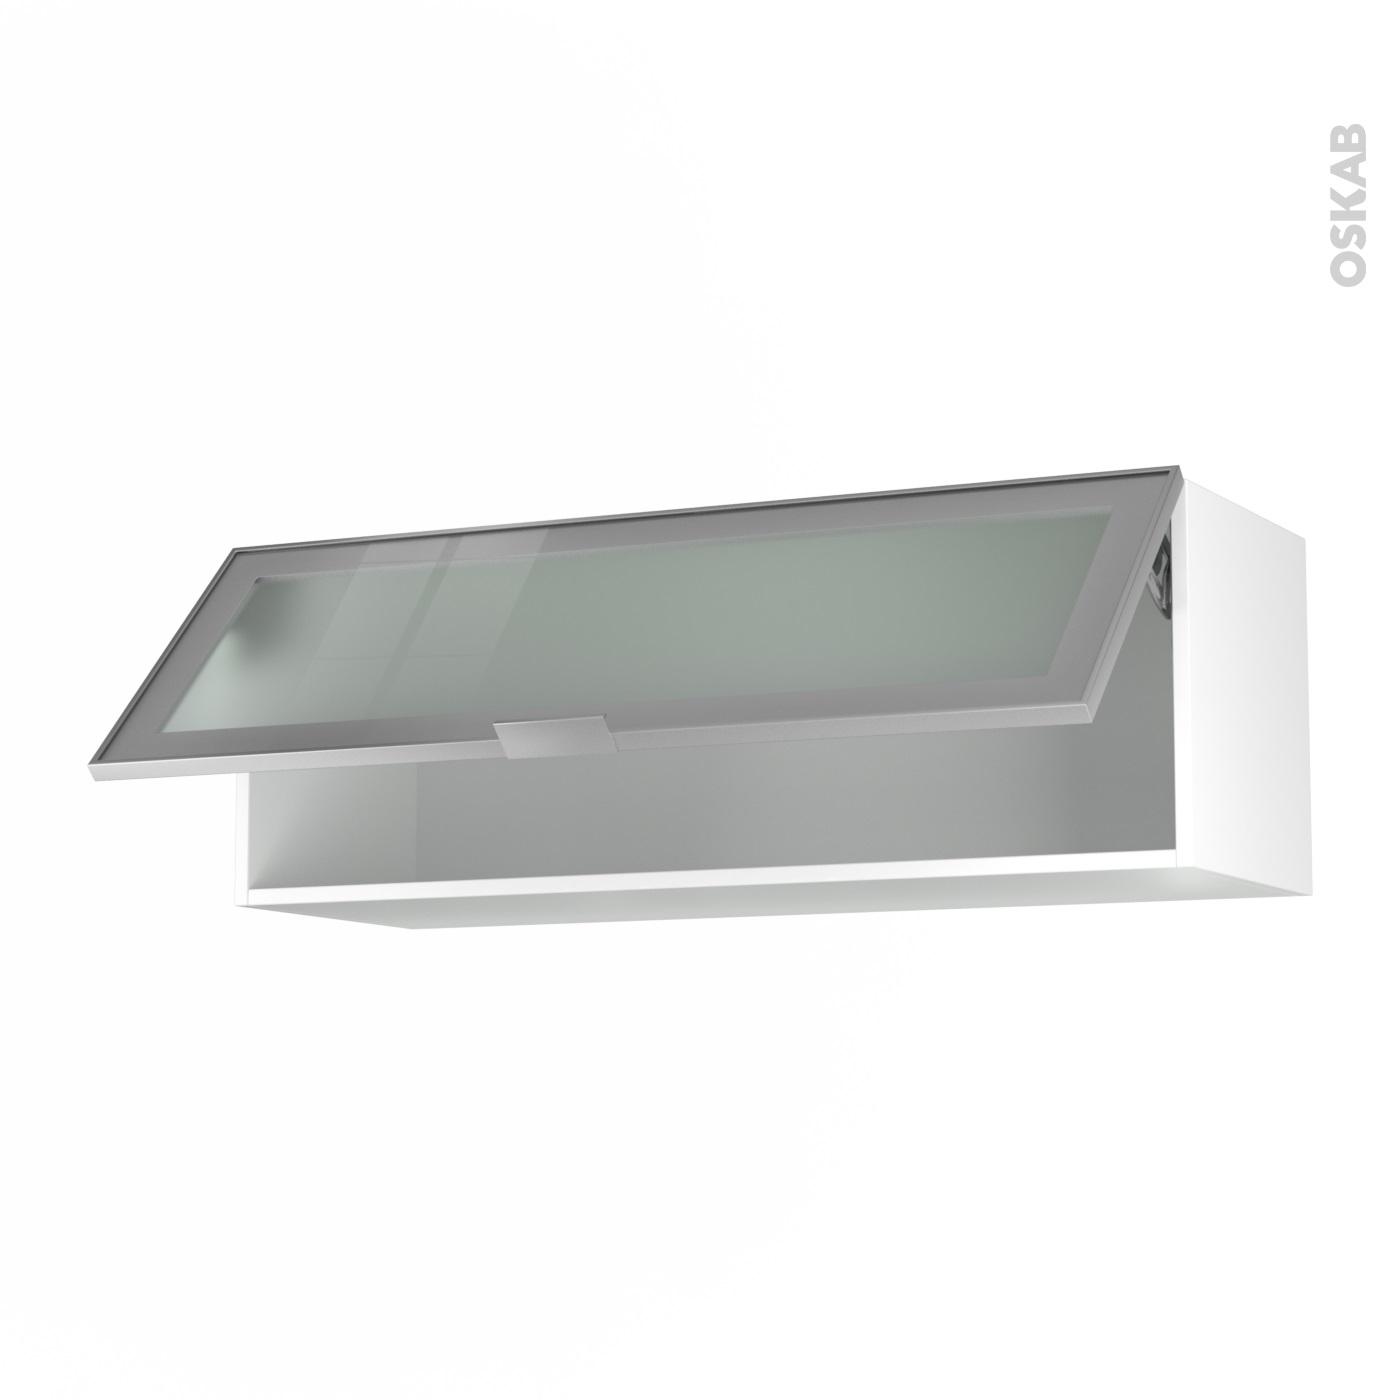 meuble de cuisine haut abattant vitré façade alu 1 porte l100 x h35